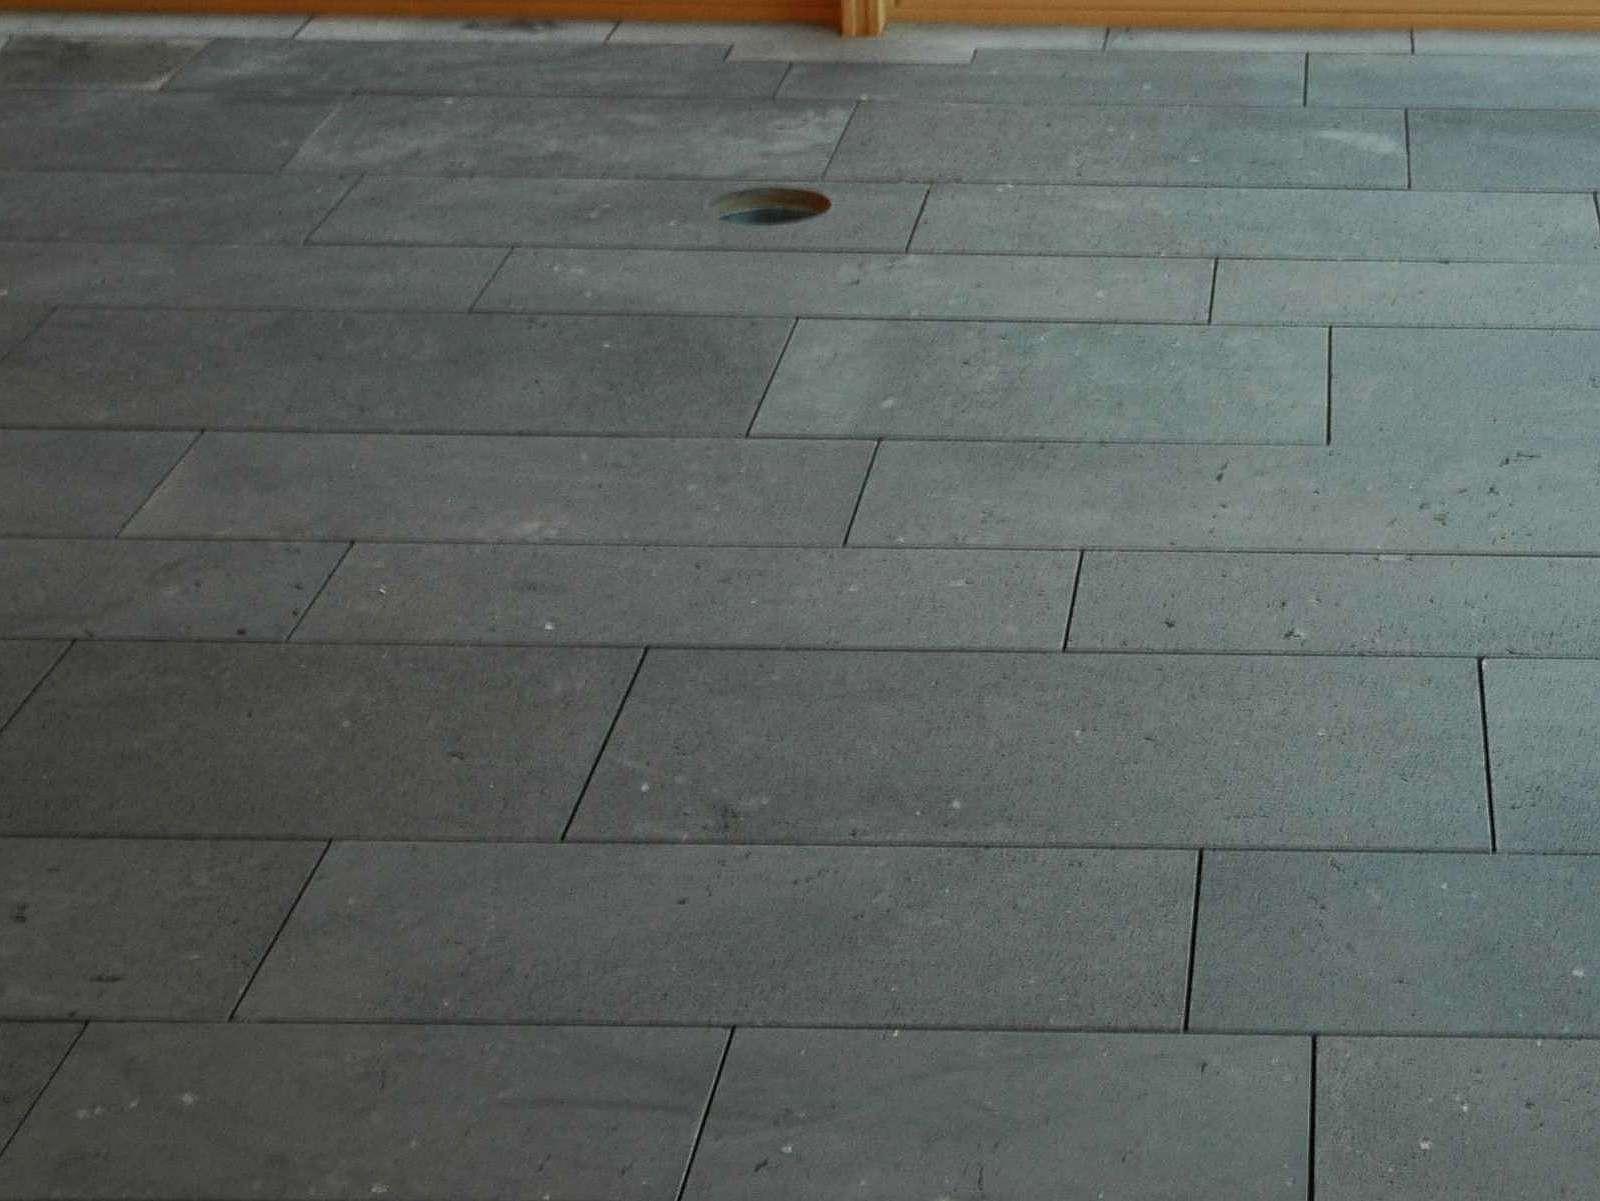 terrassenplatte bahnenware basaltlava eifel. Black Bedroom Furniture Sets. Home Design Ideas